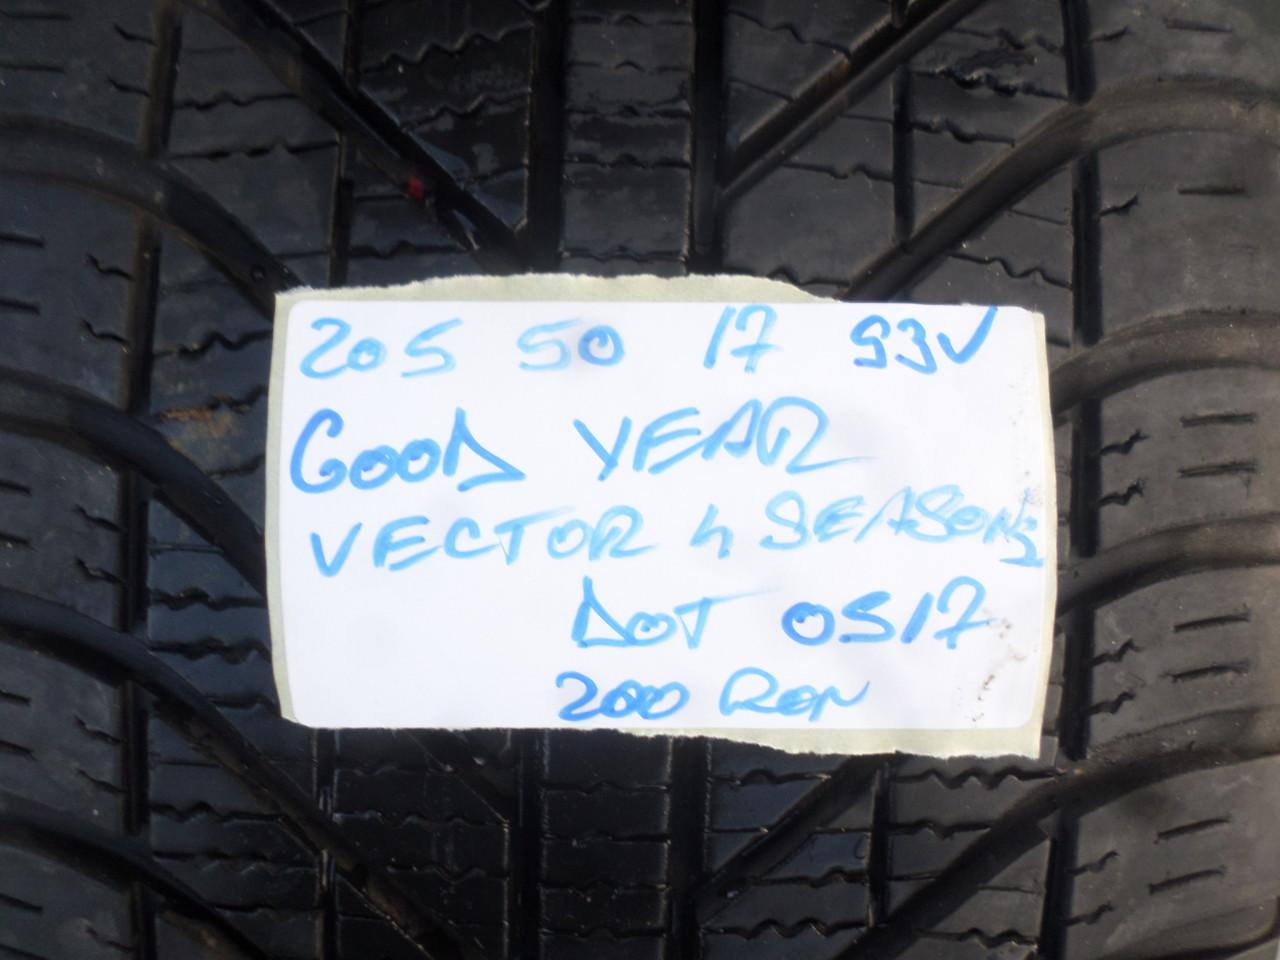 Jante seat leon FR 17 zoll 205 50 17 iarna Goodyear vector4season